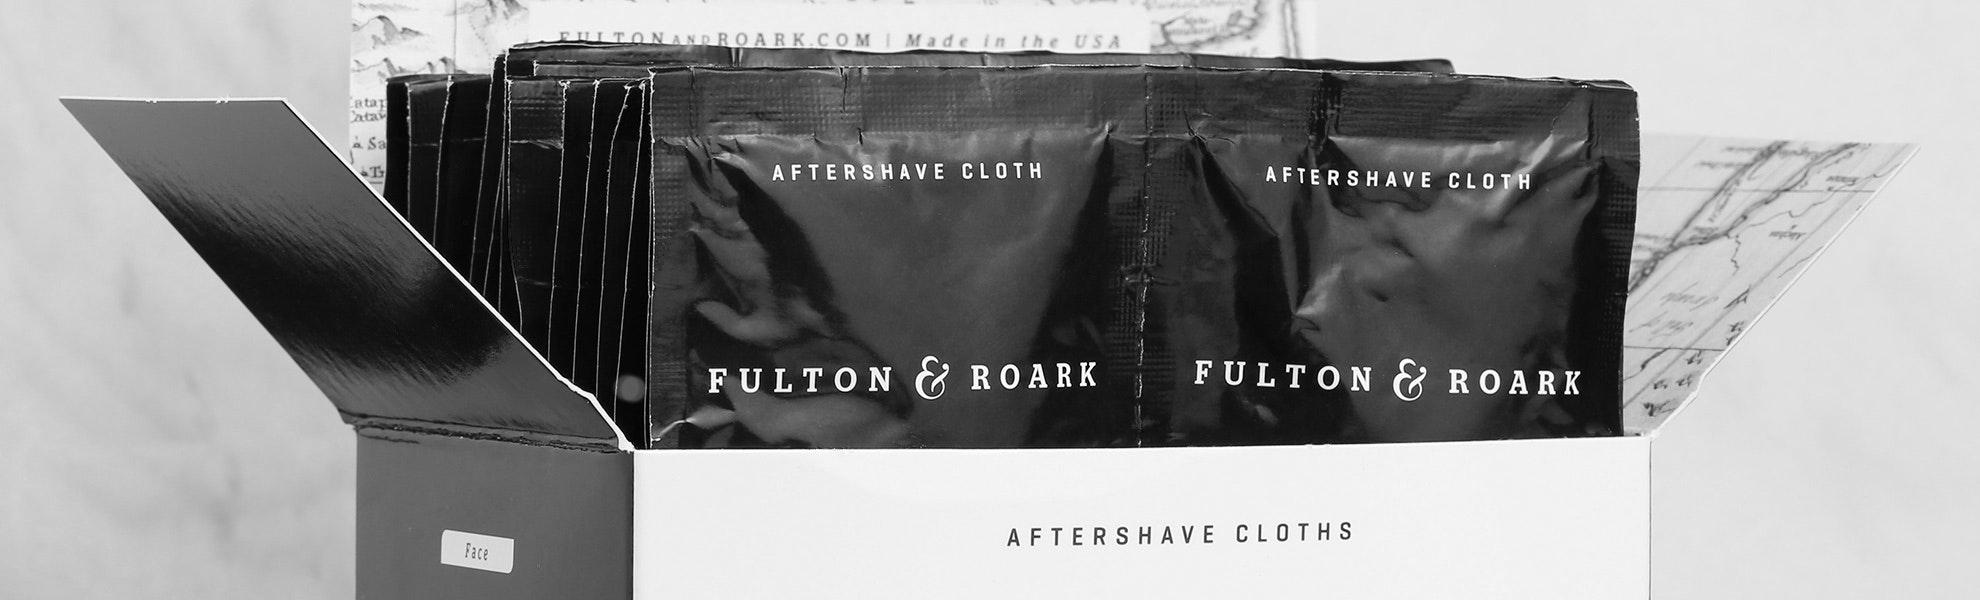 Fulton & Roark Aftershave Cloths